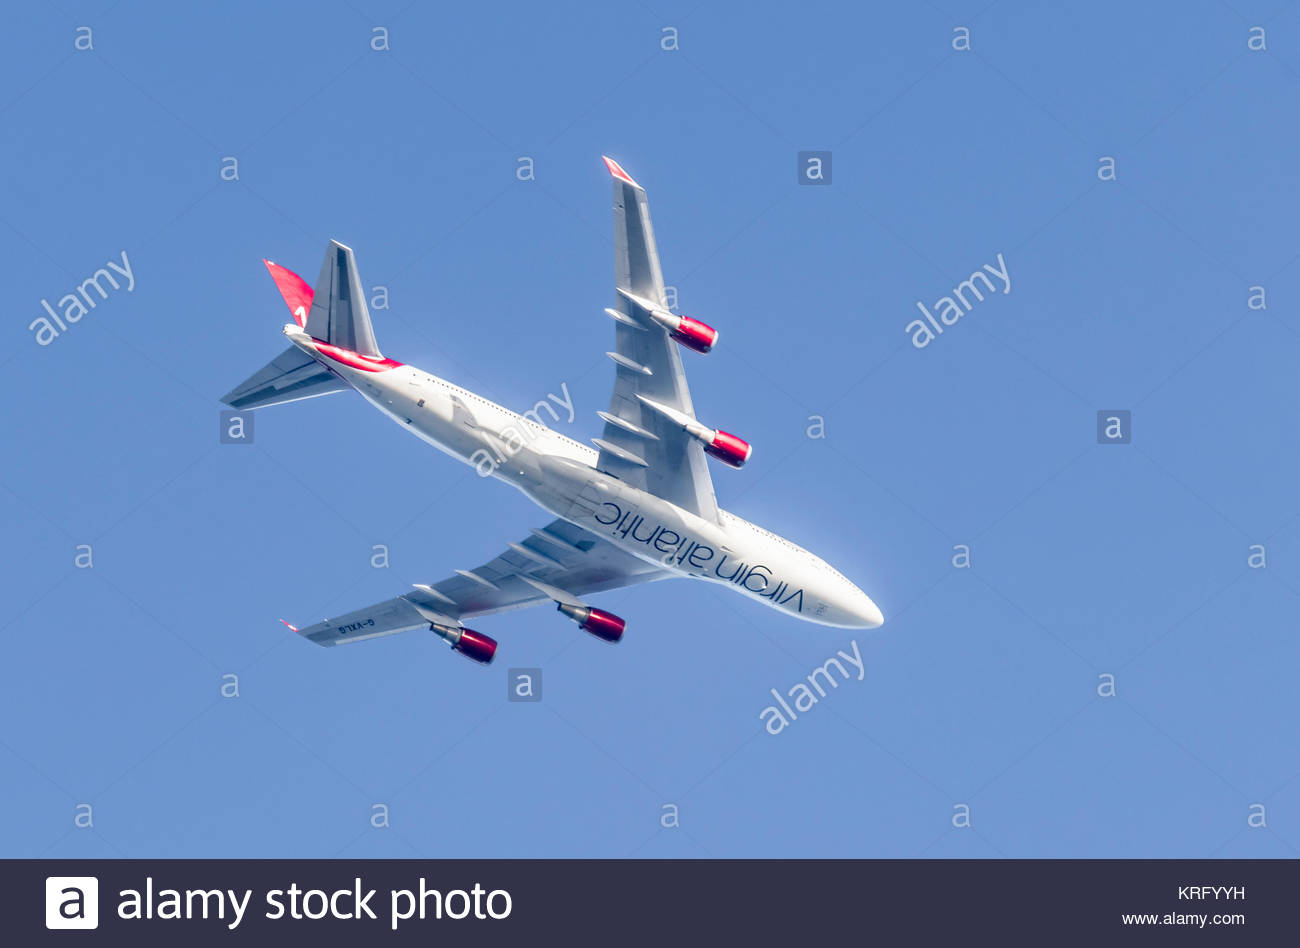 Virgin Atlantic Aeroplane flying high against blue sky in the UK. - Stock Image